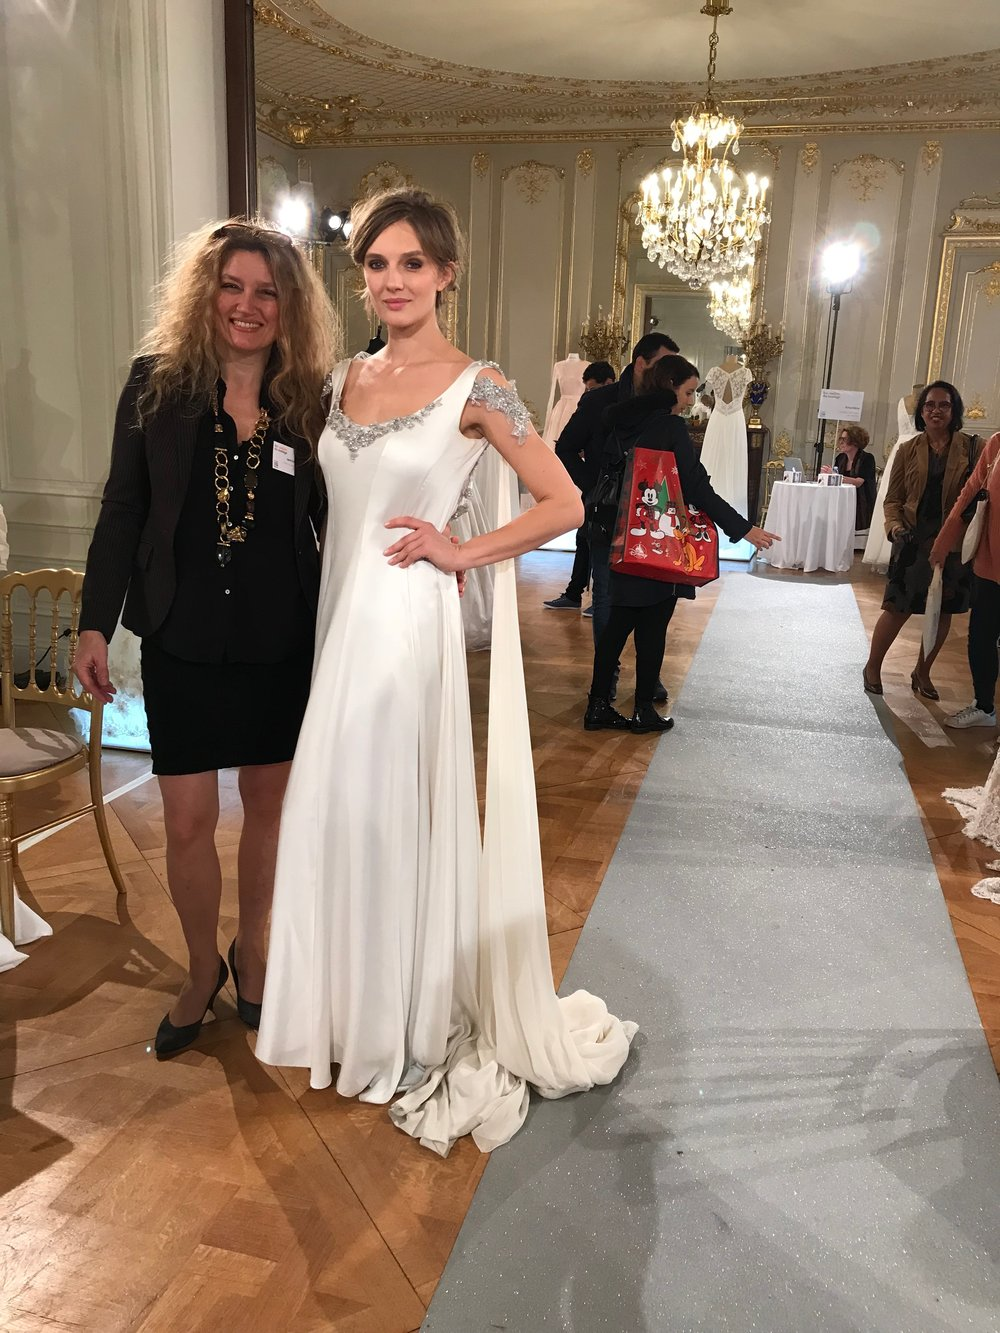 Coulisses du Mariage 2017 Agnes Szabelewski.jpg